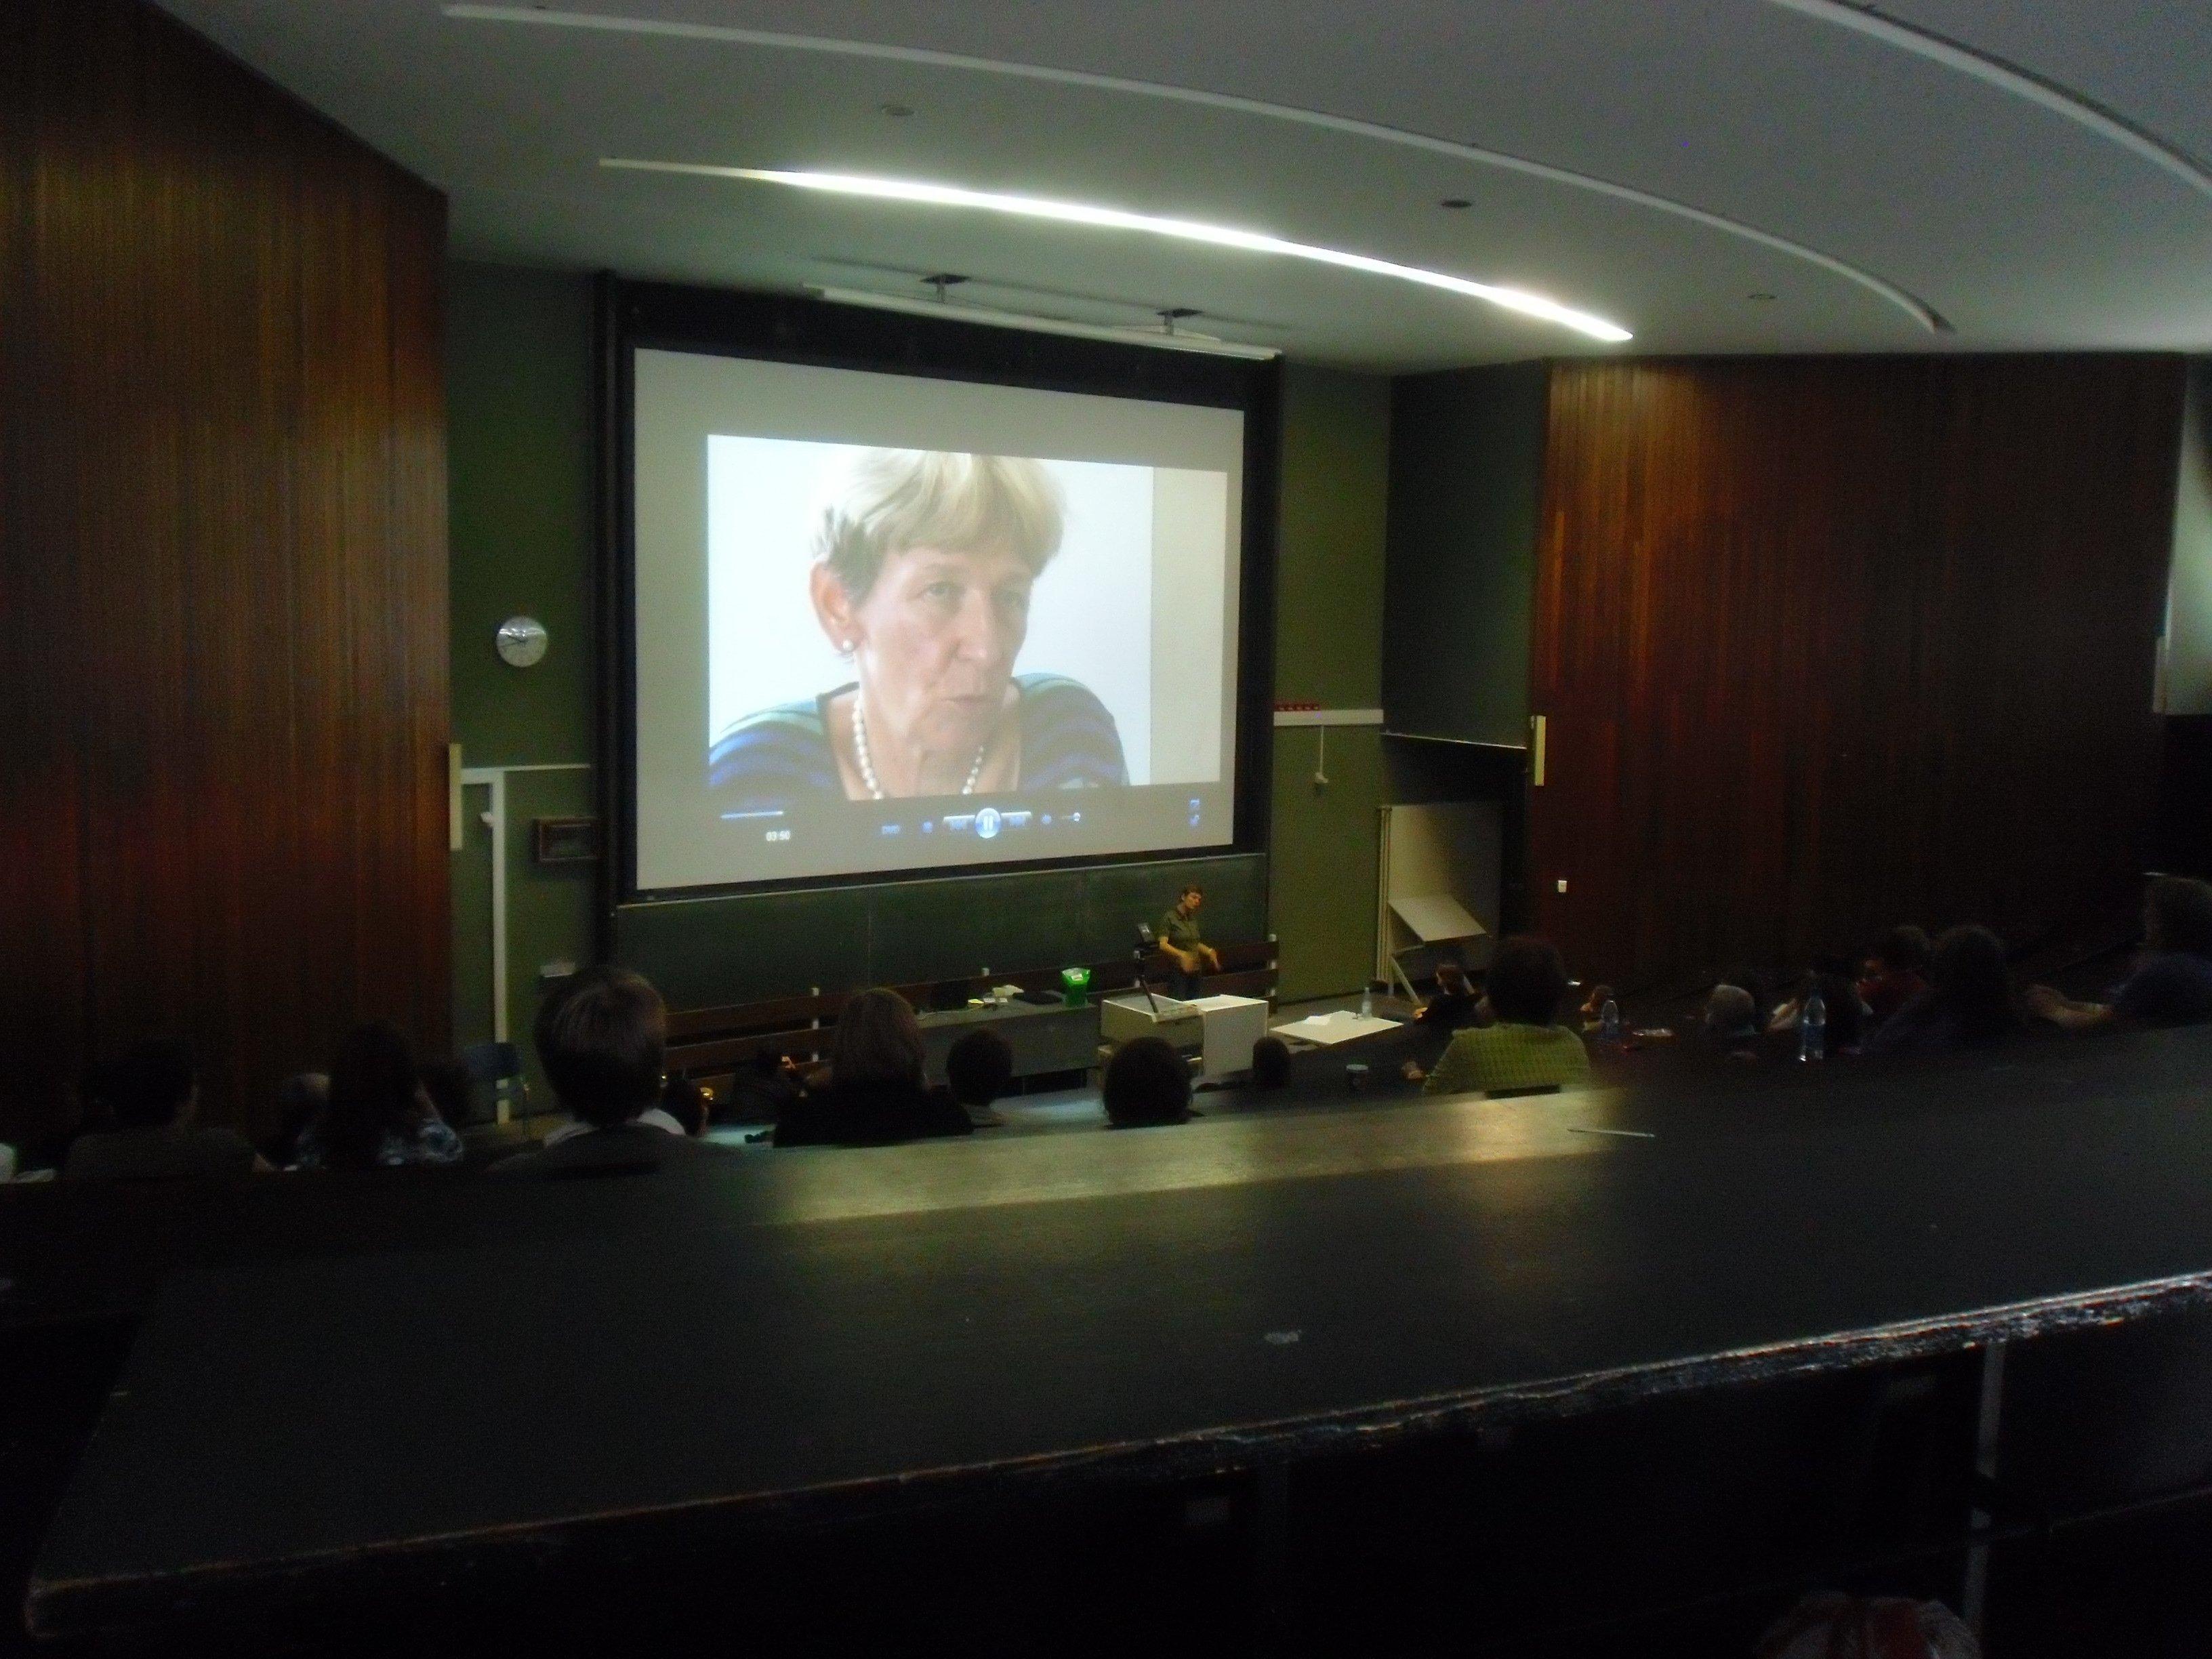 Kinosaal LFT - C. Perincioli auf der Leinwand